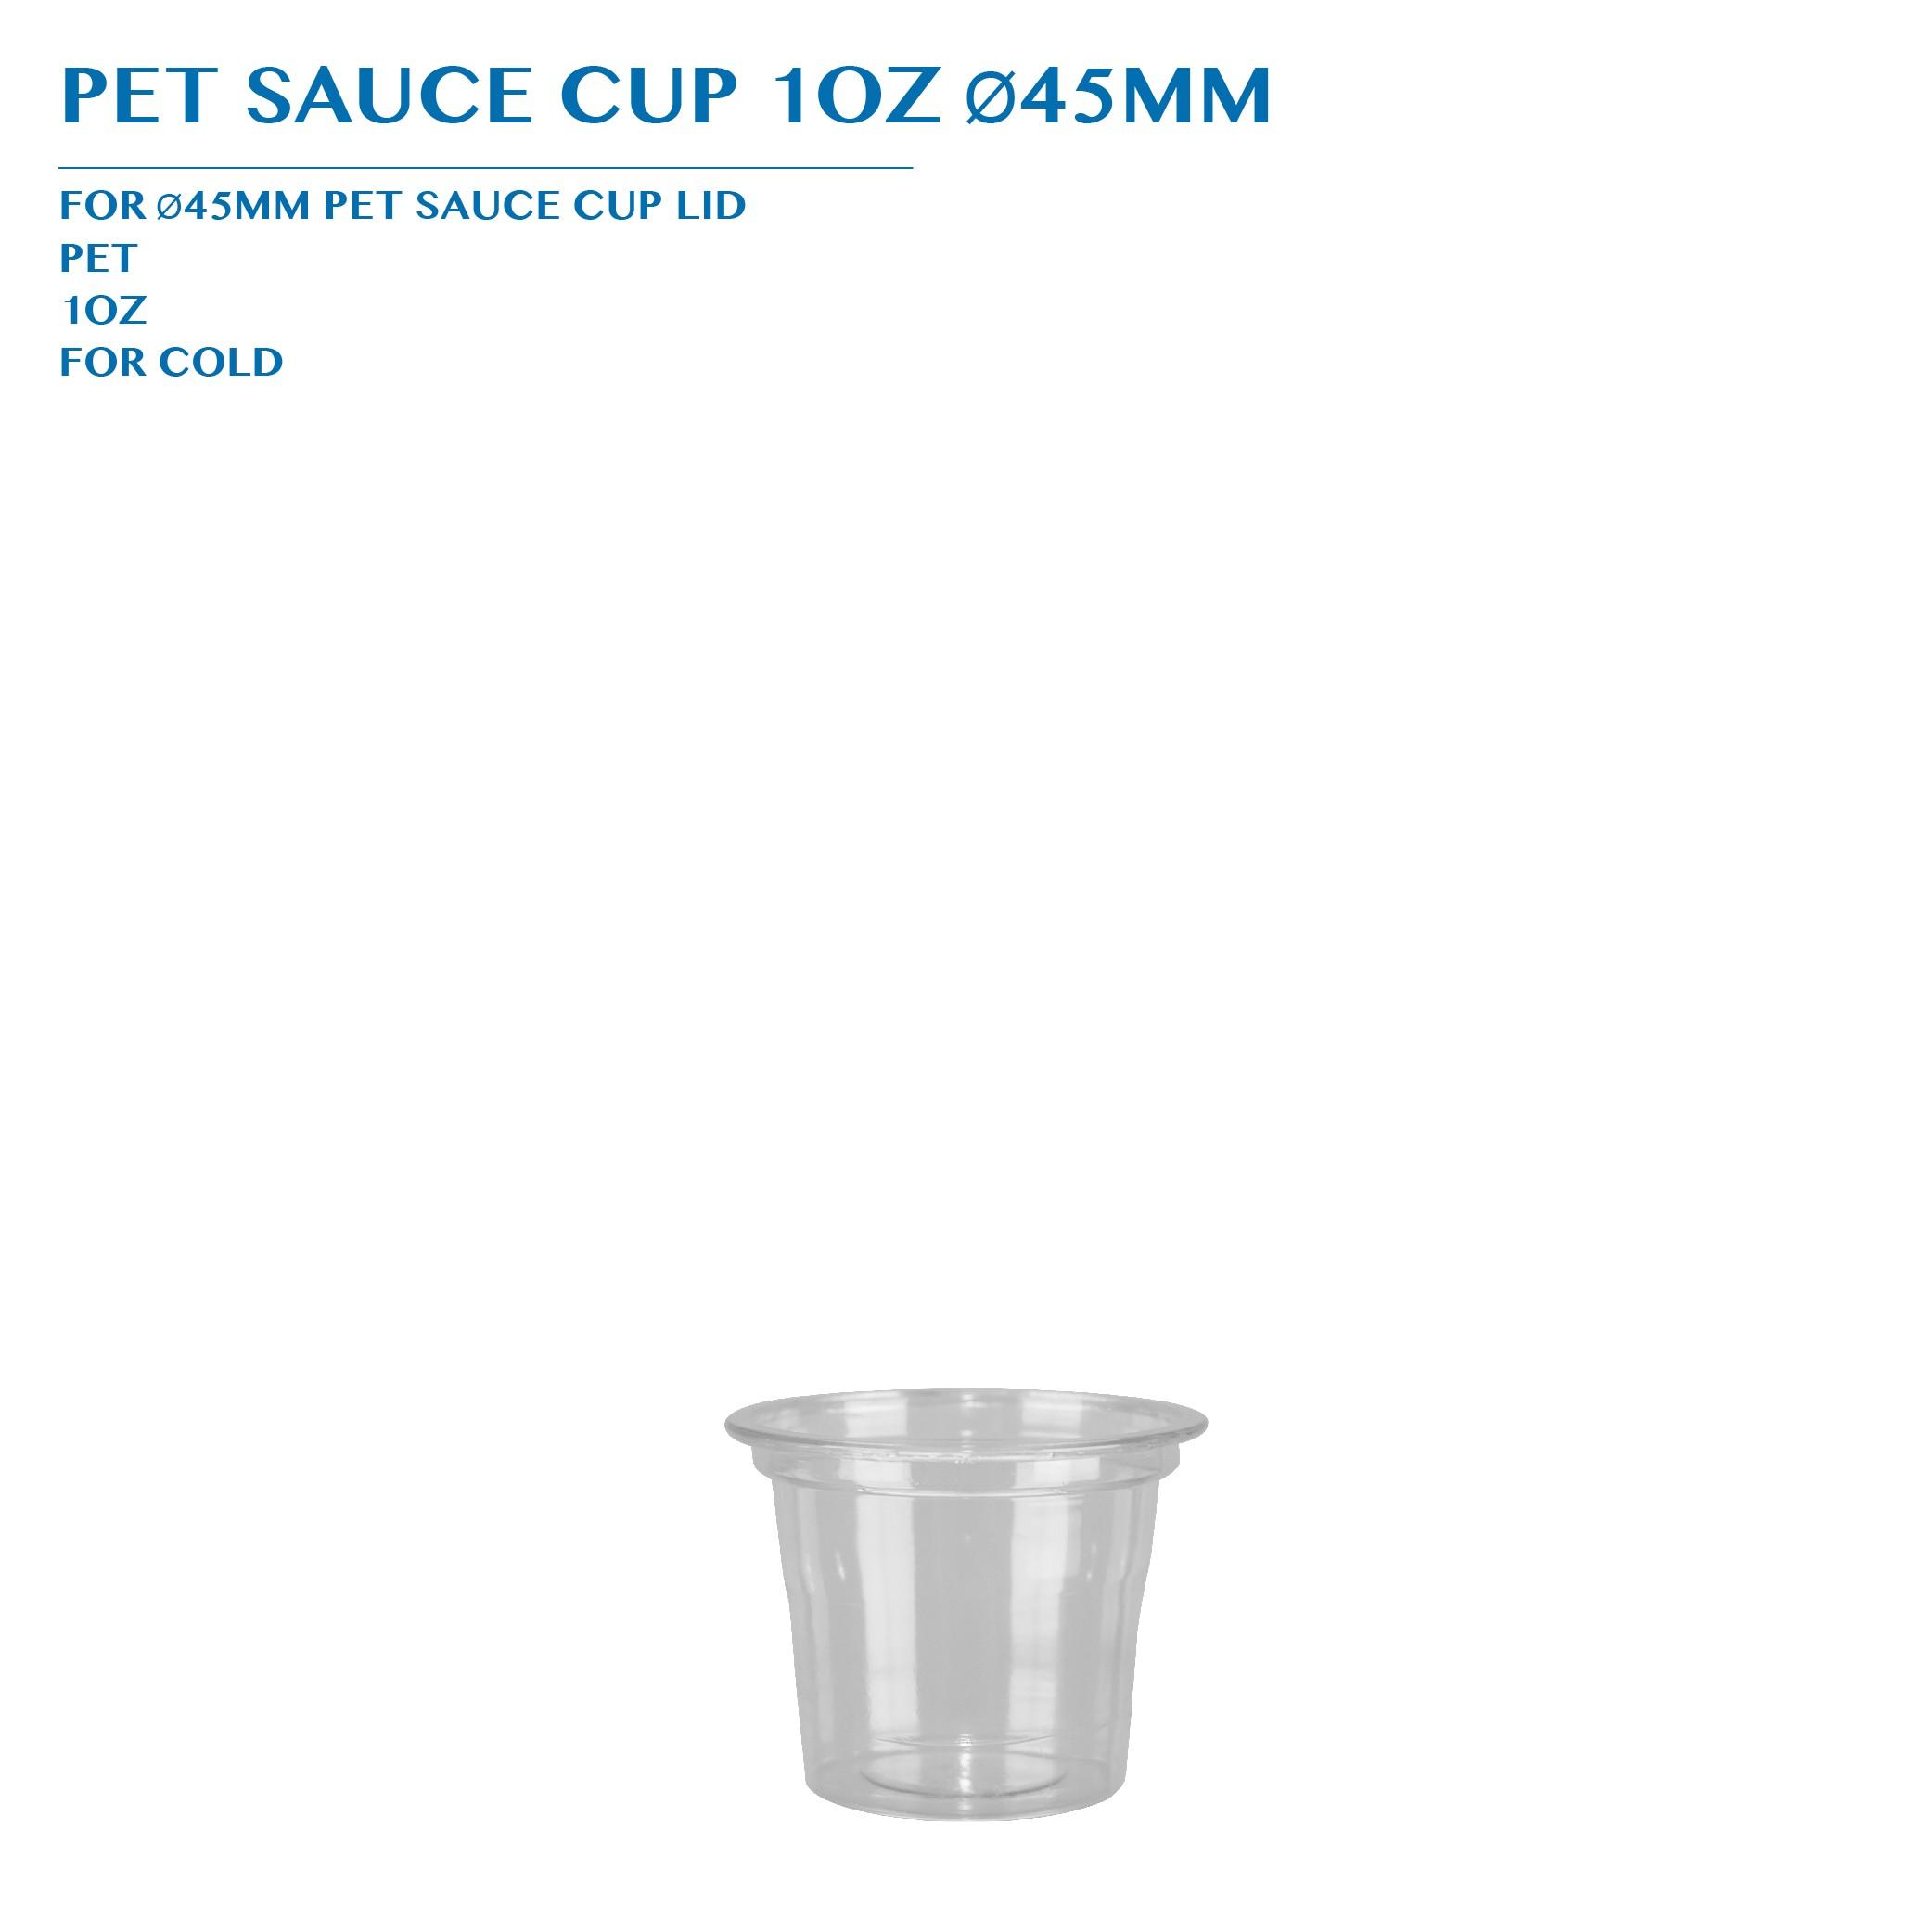 PRE-ORDER PET SAUCE CUP 1OZ Ø45MM PCS/CTN